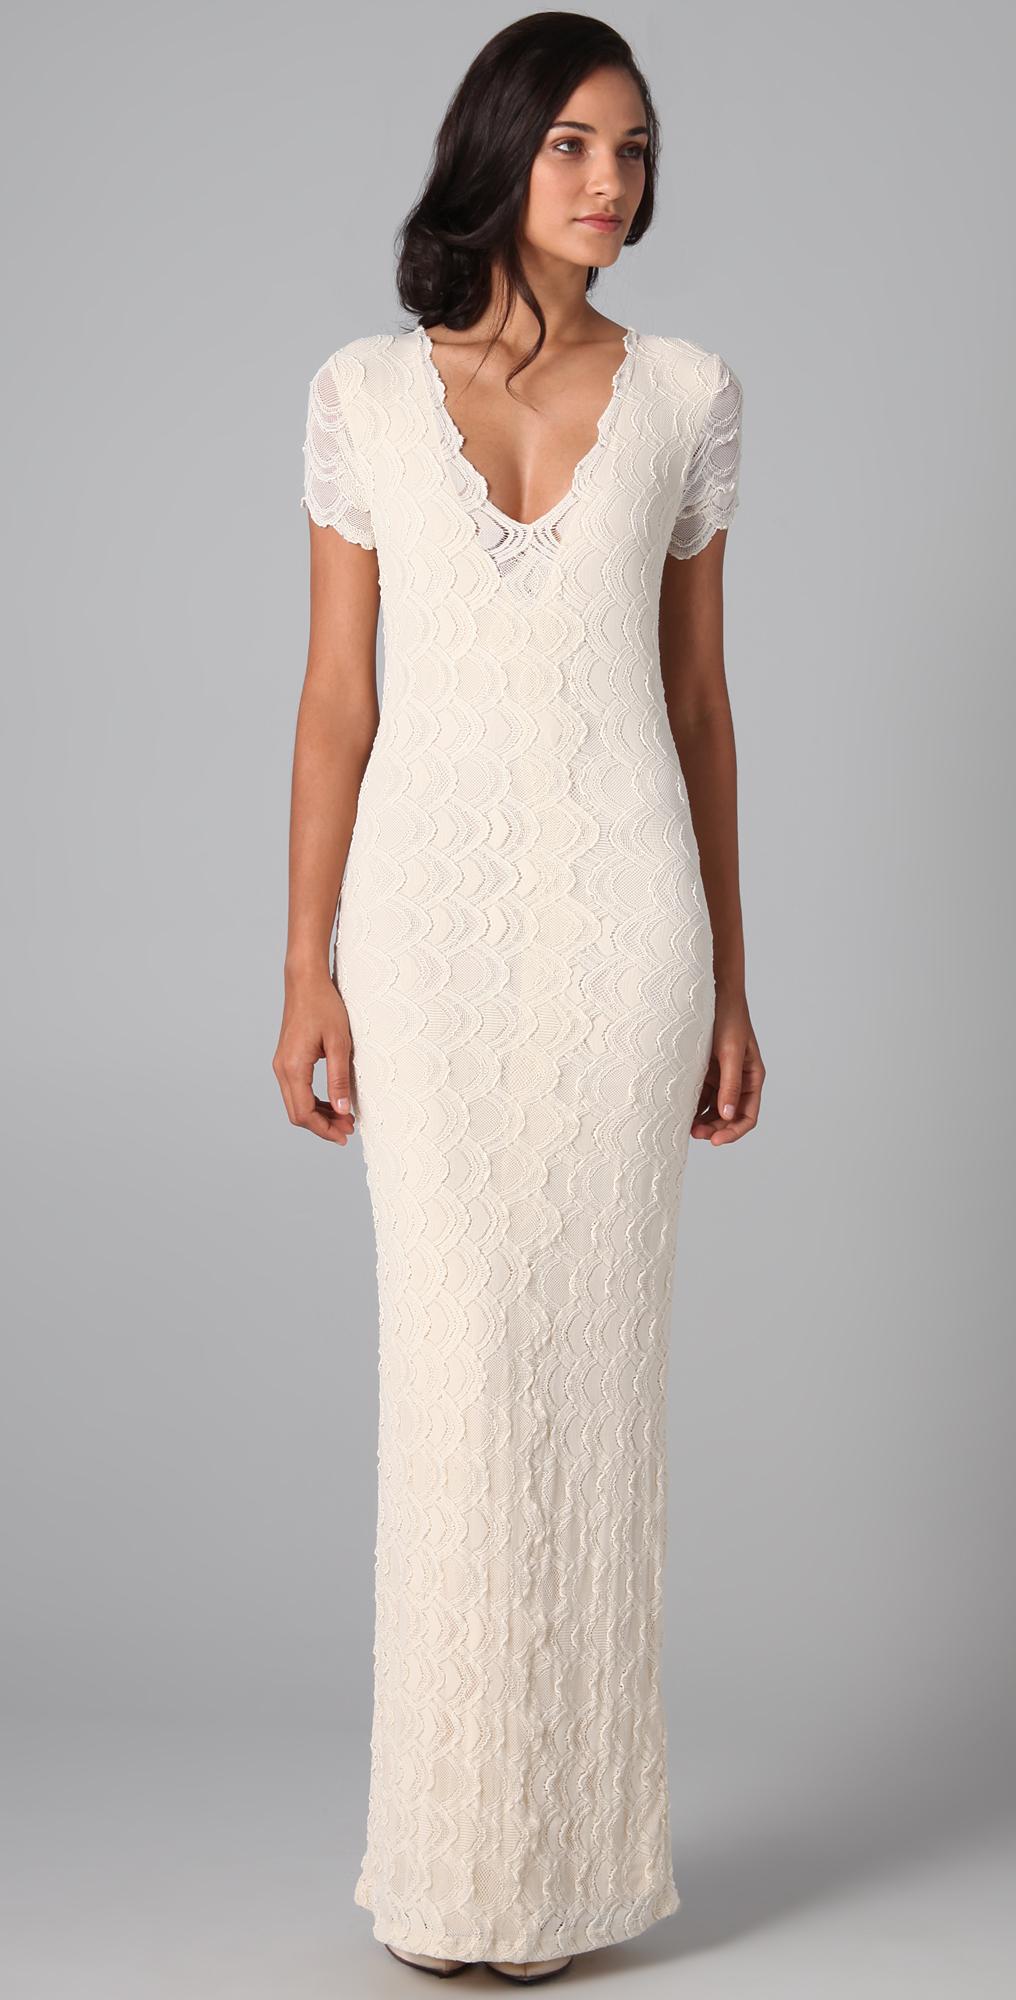 e75557b3c5 Nightcap Clothing Victorian Lace Cap Sleeve Dress on PopScreen